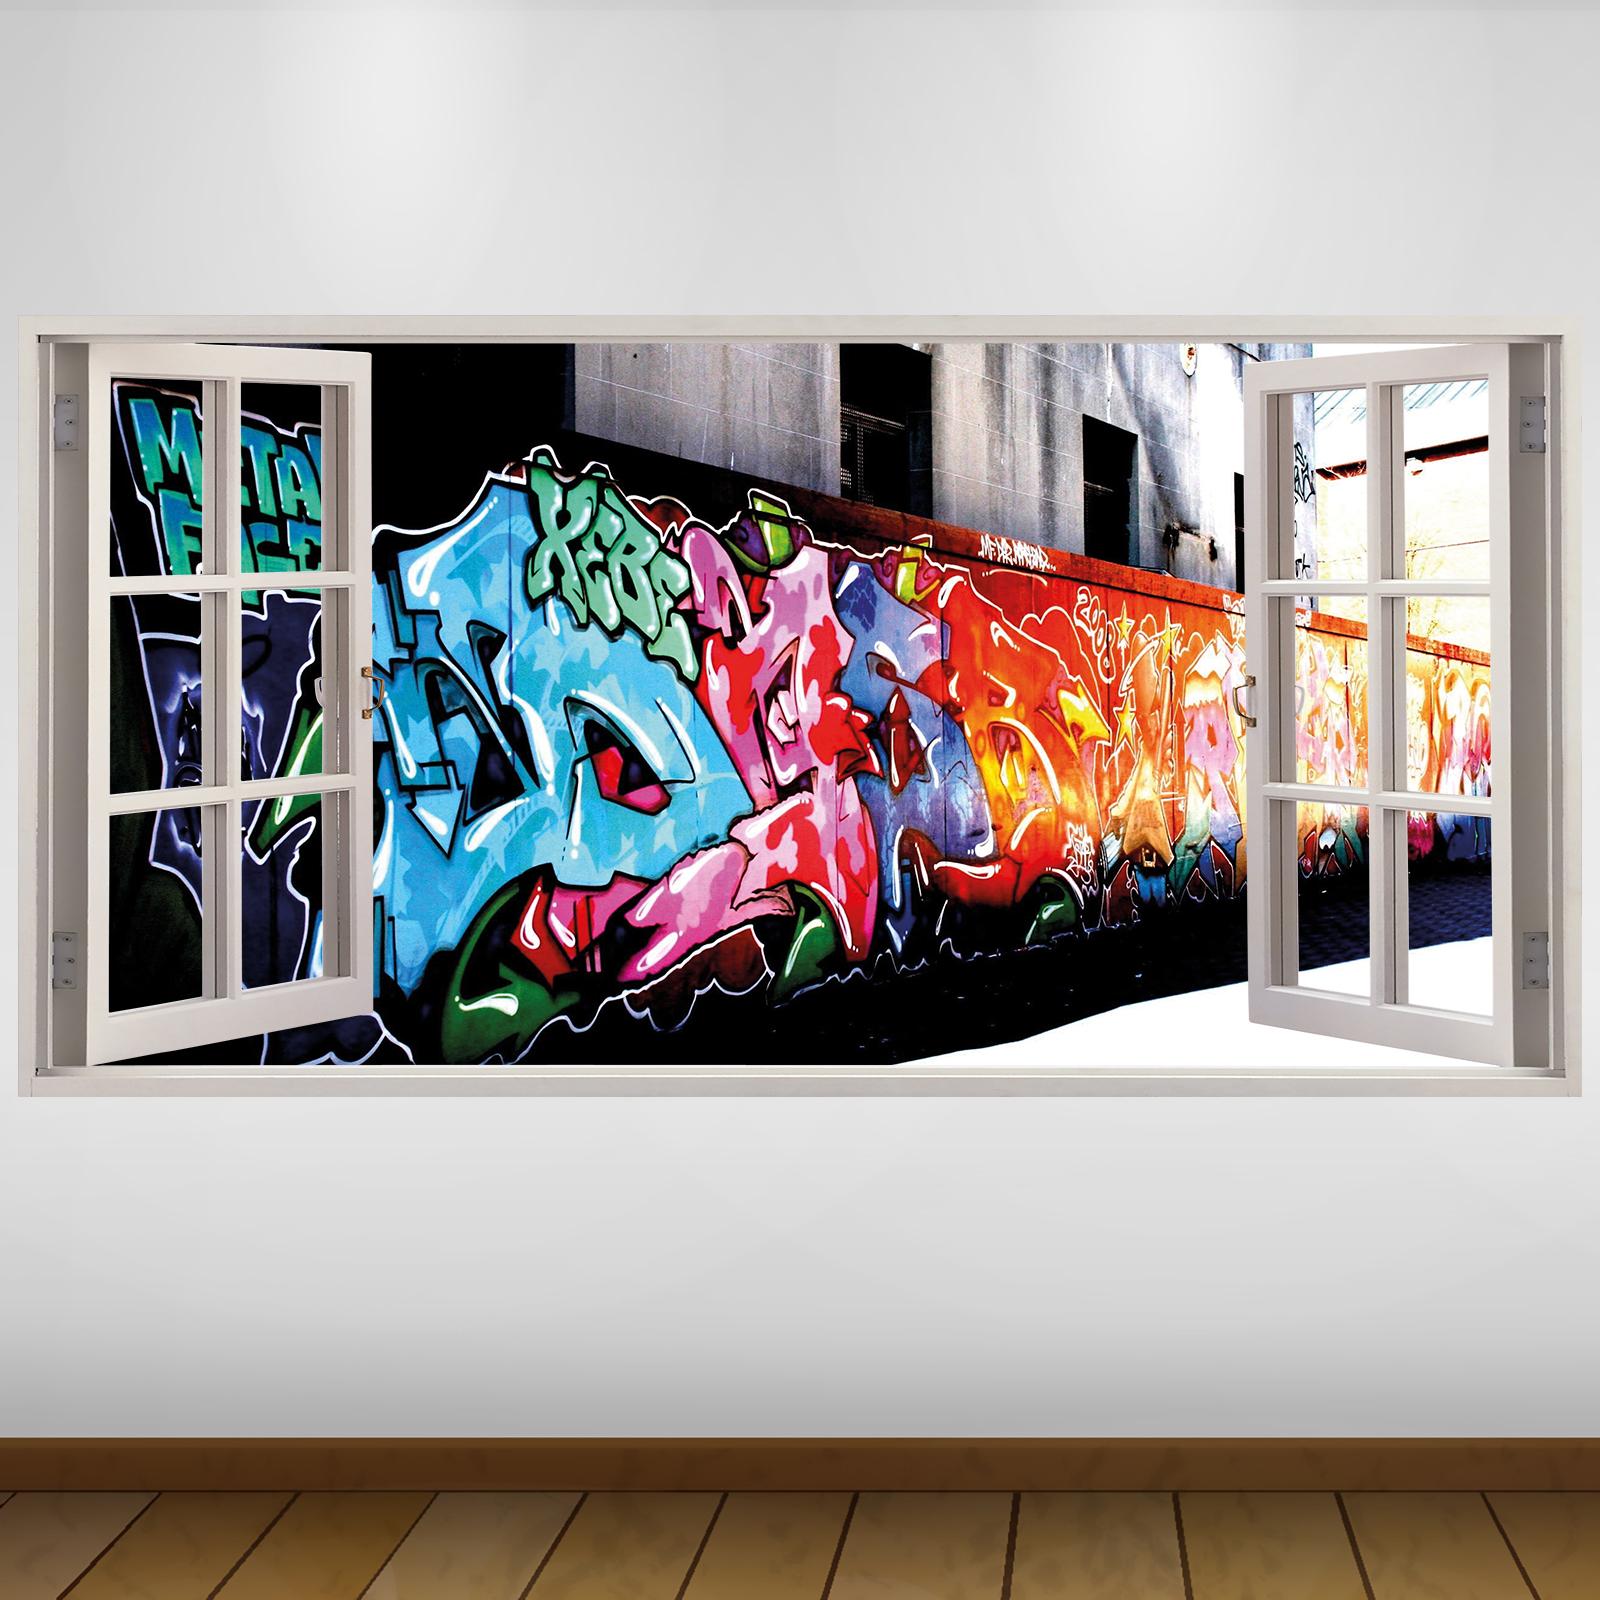 EXTRA LARGE Graffiti Wall City 3D Vinyl Wall Art Decal ...